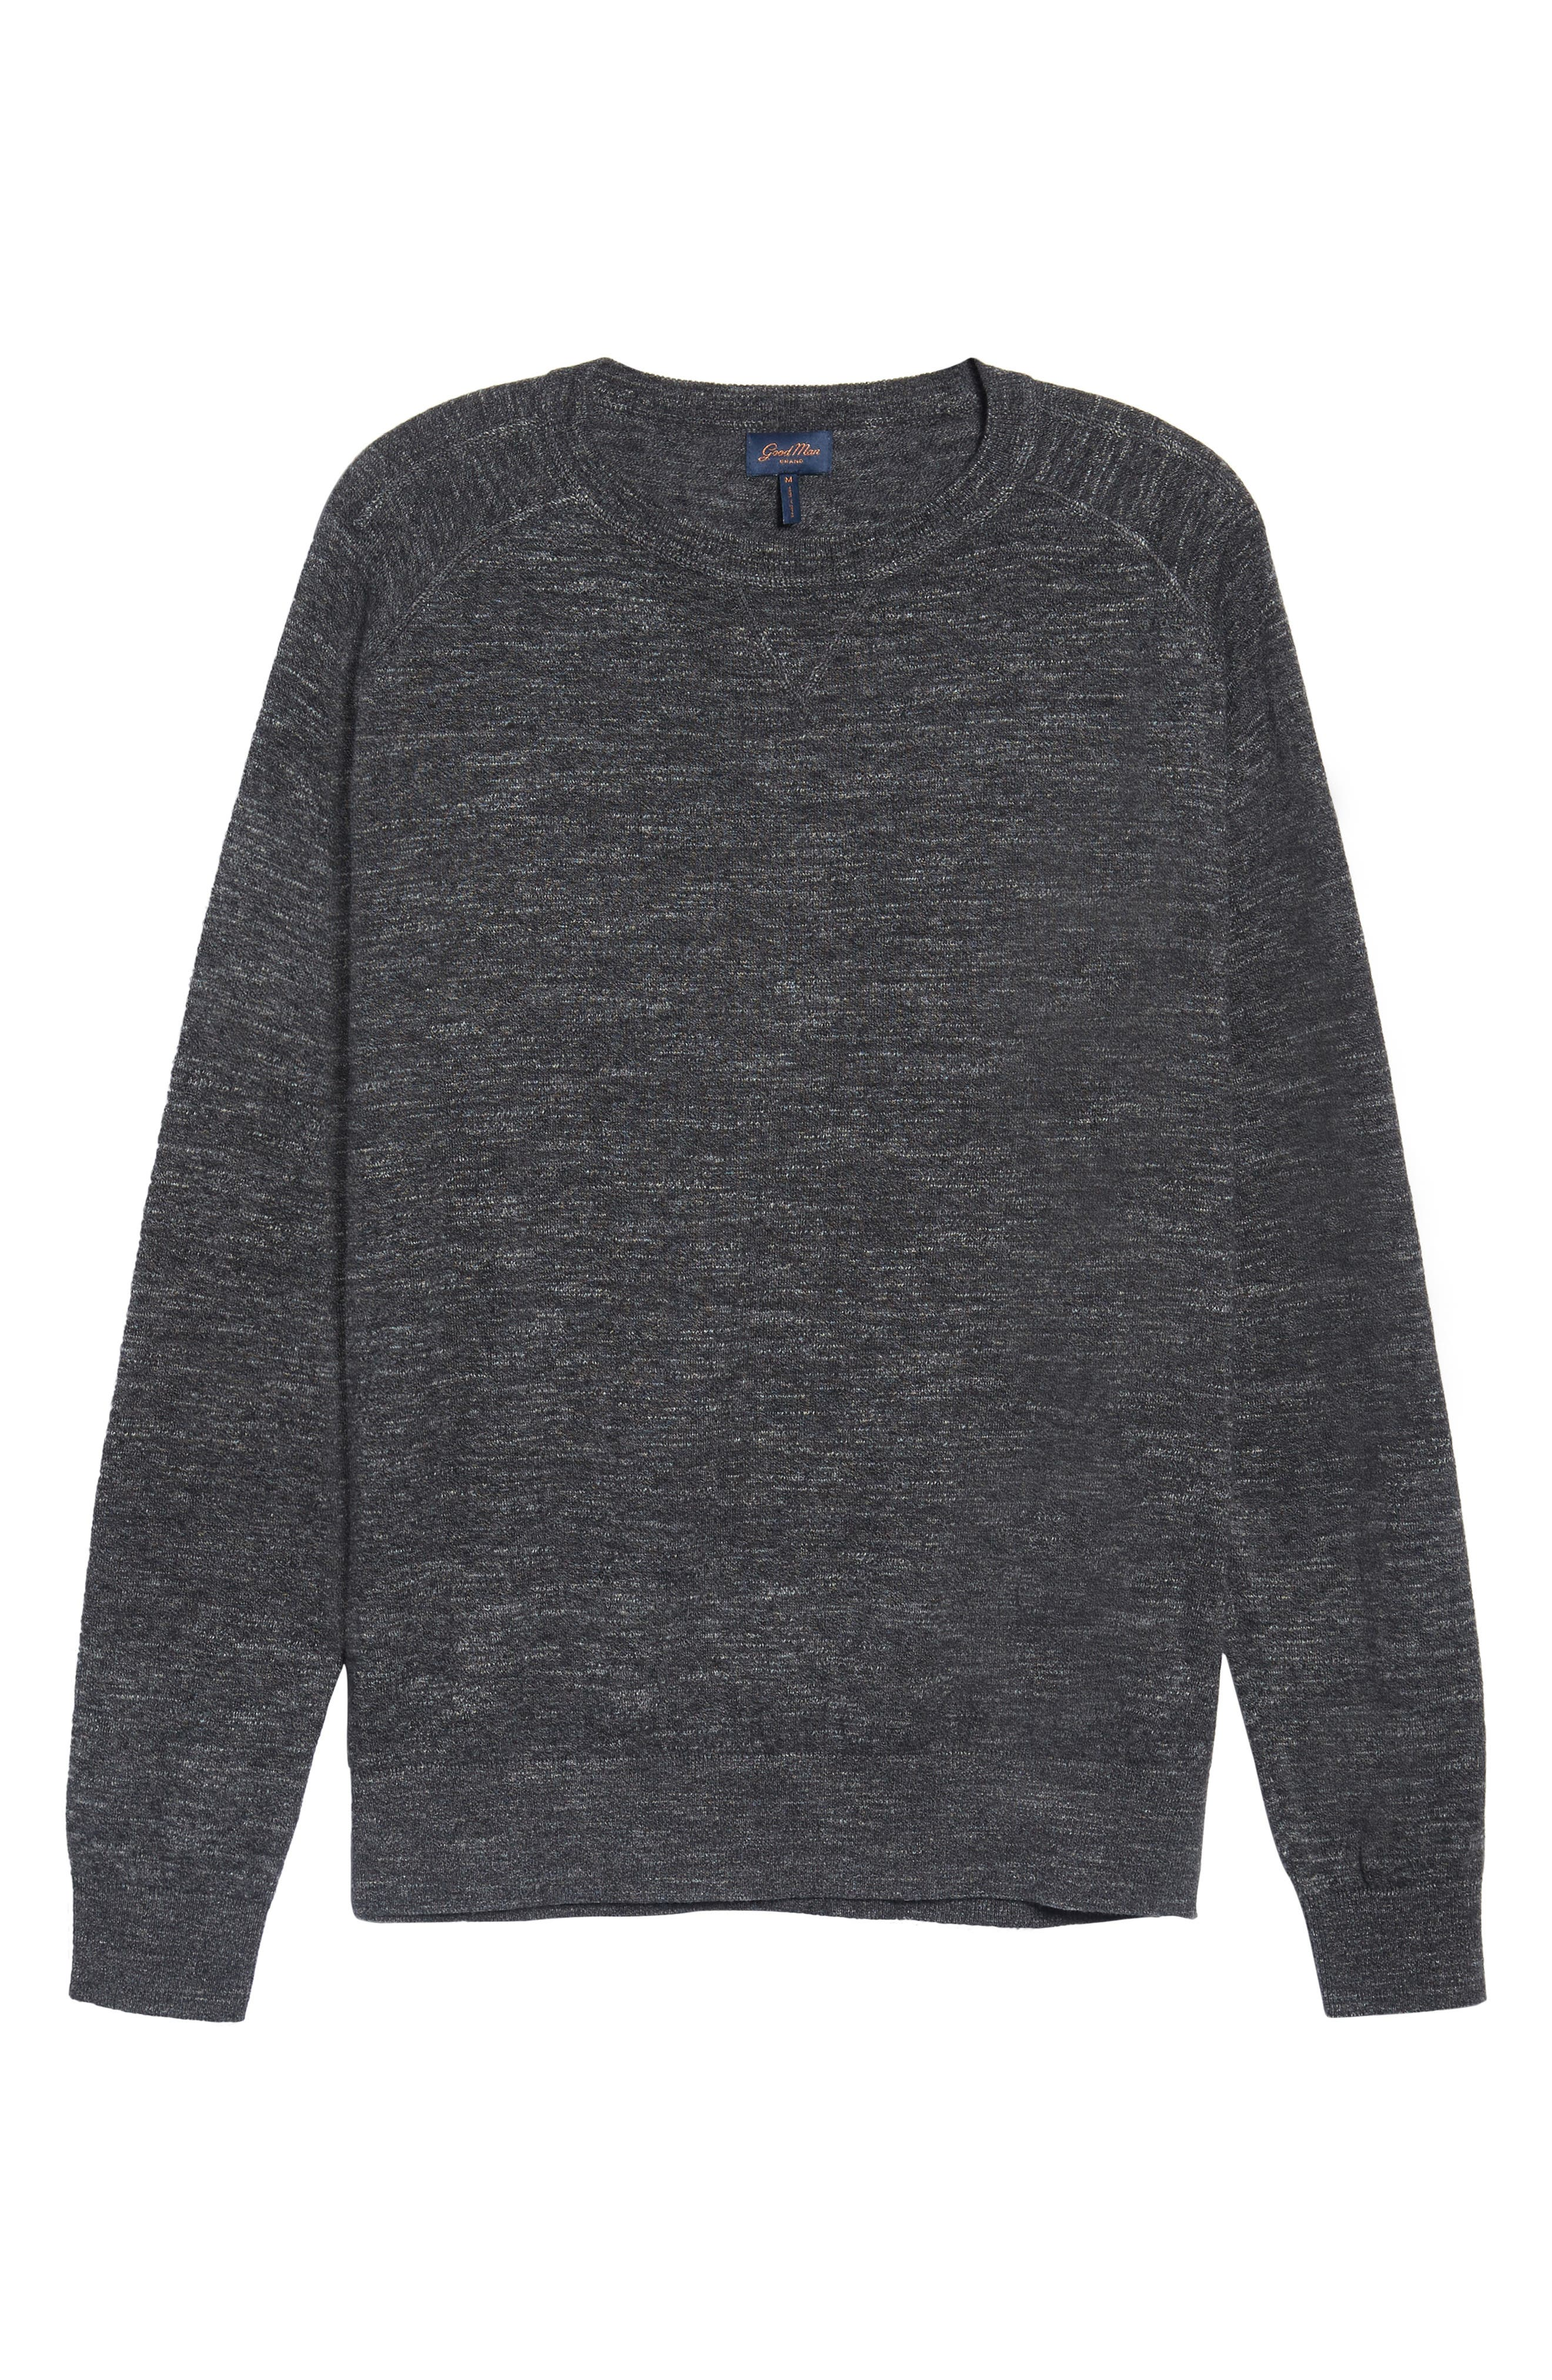 Slub Pullover Sweater,                             Alternate thumbnail 6, color,                             020